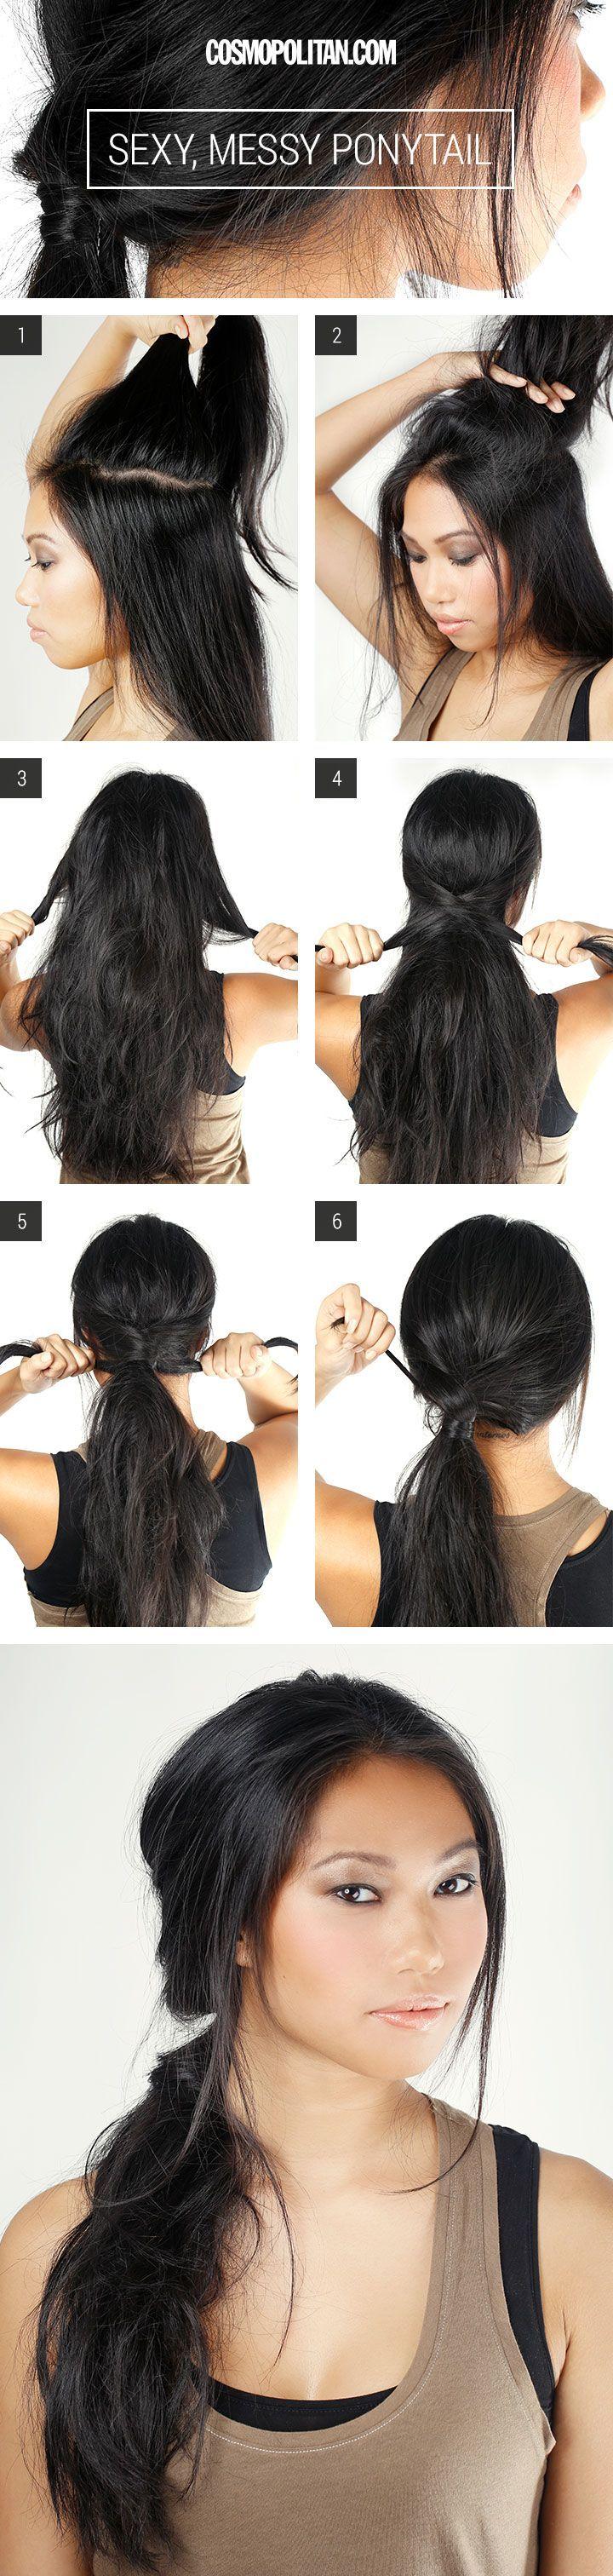 SEXY, MESSY PONYTAIL - HAIR TUTORIAL